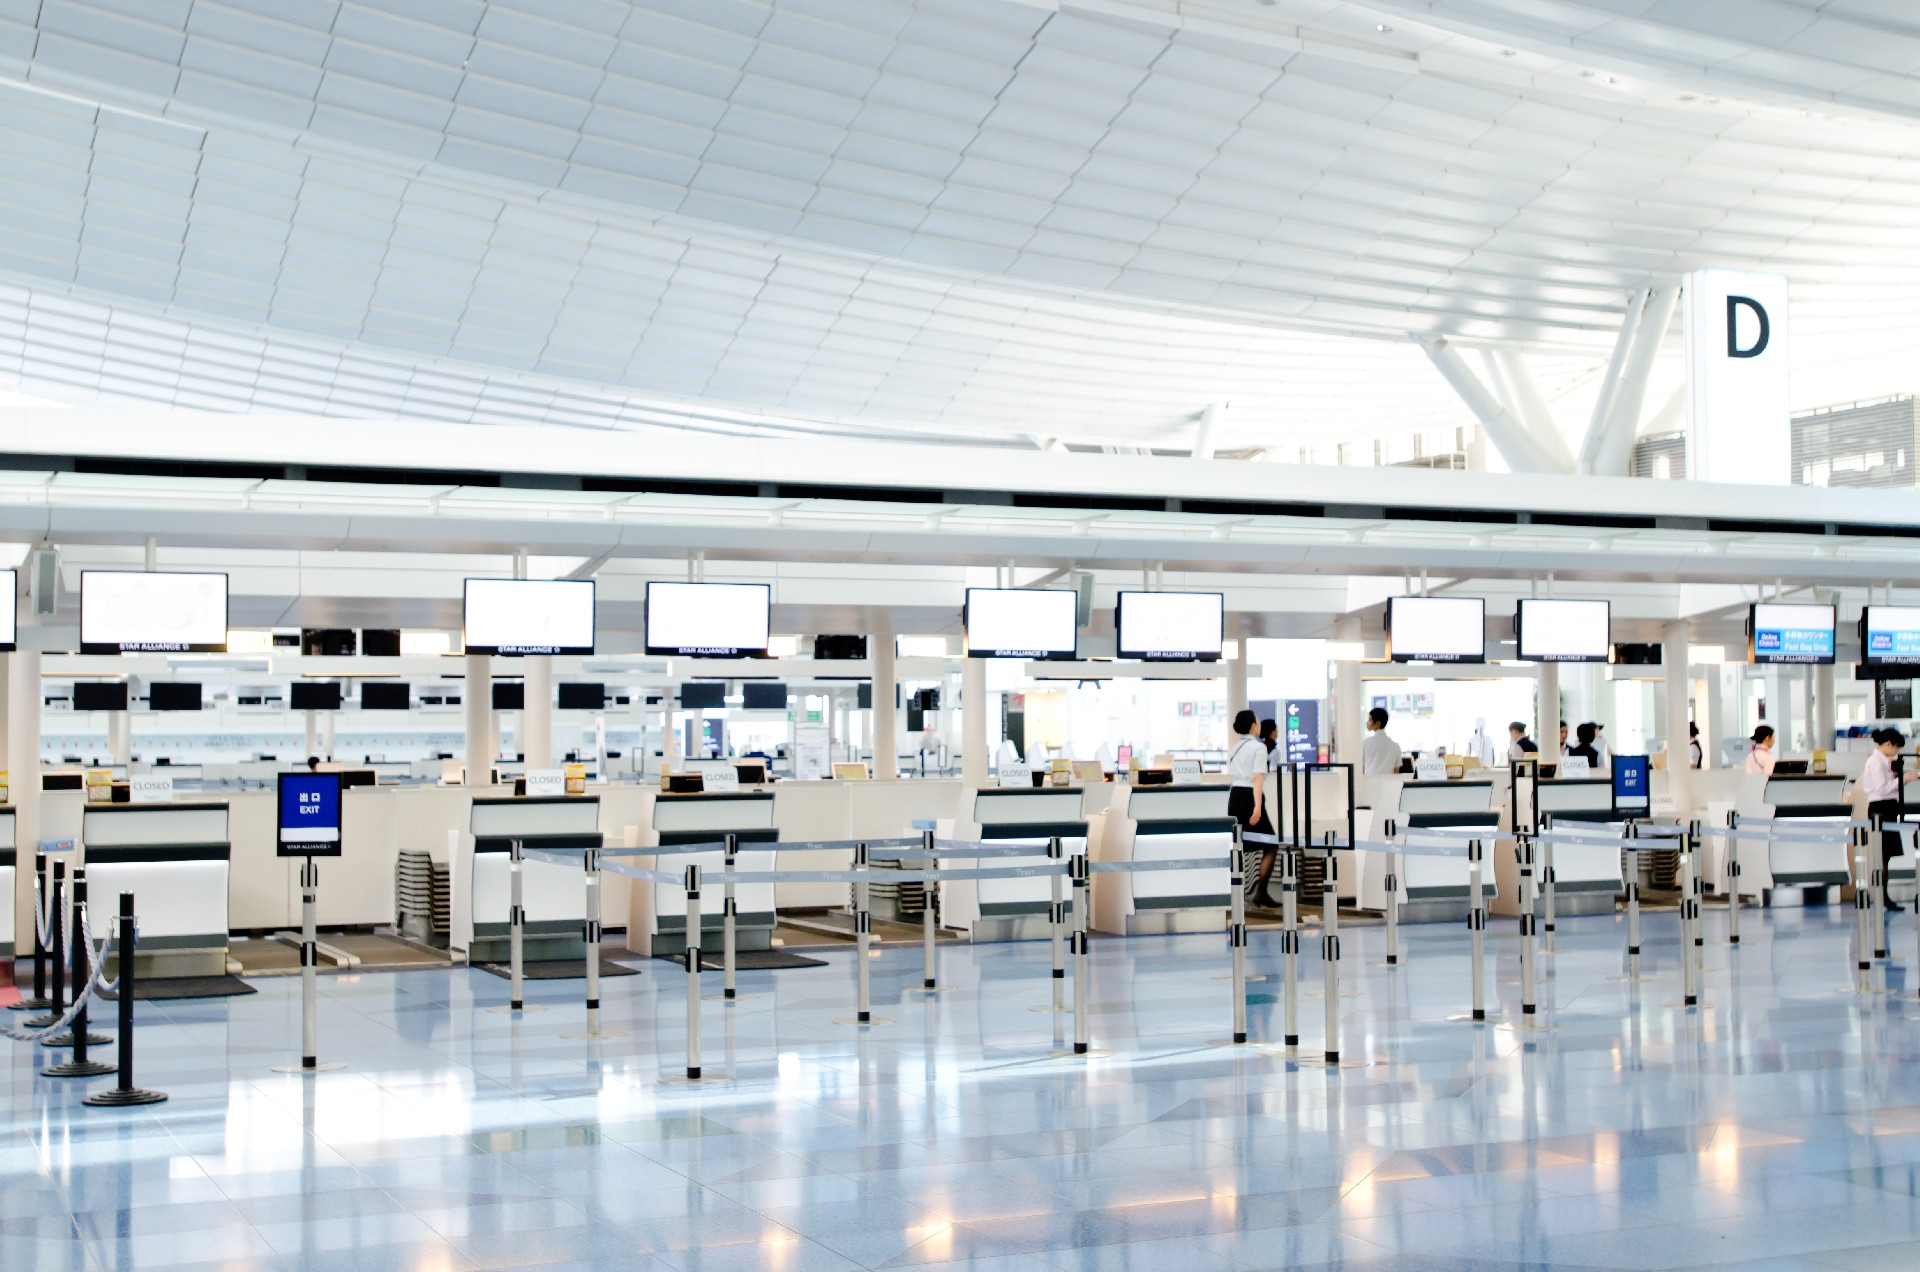 dabc9b38bf13 空港で働いてるけど質問ある?